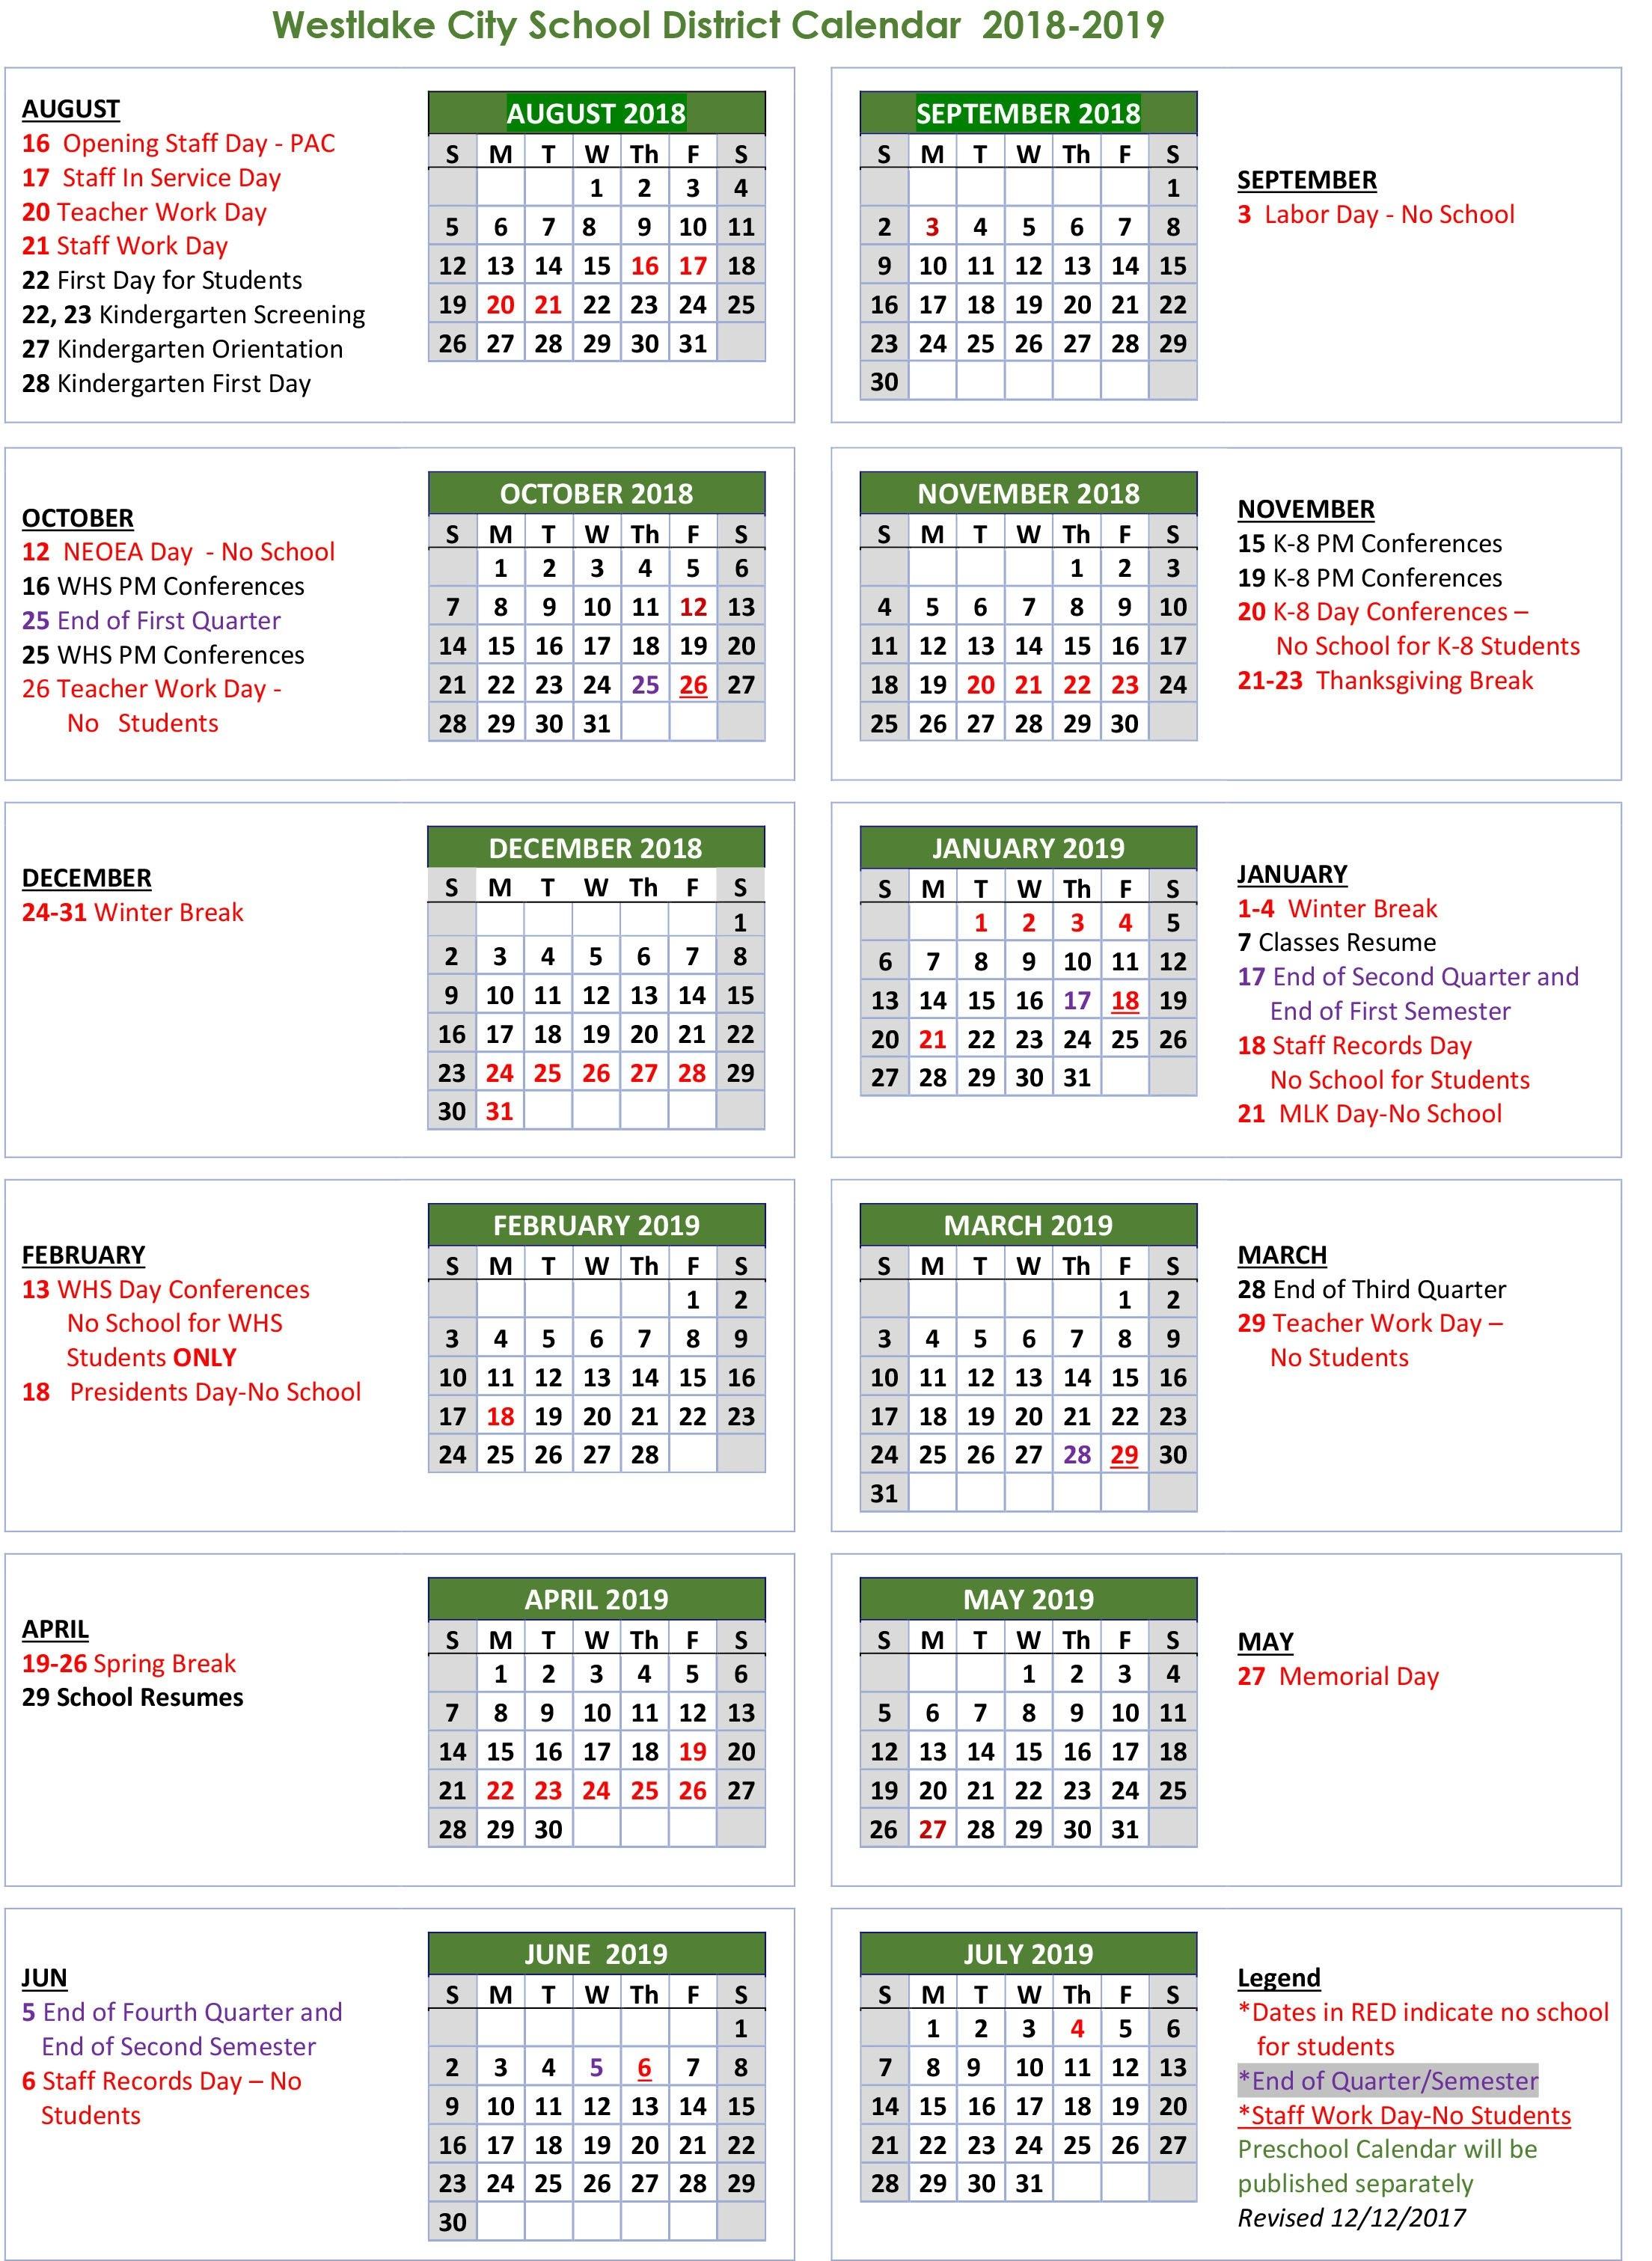 School Calendar - Westlake City School District Calendar 2019 Spring Break